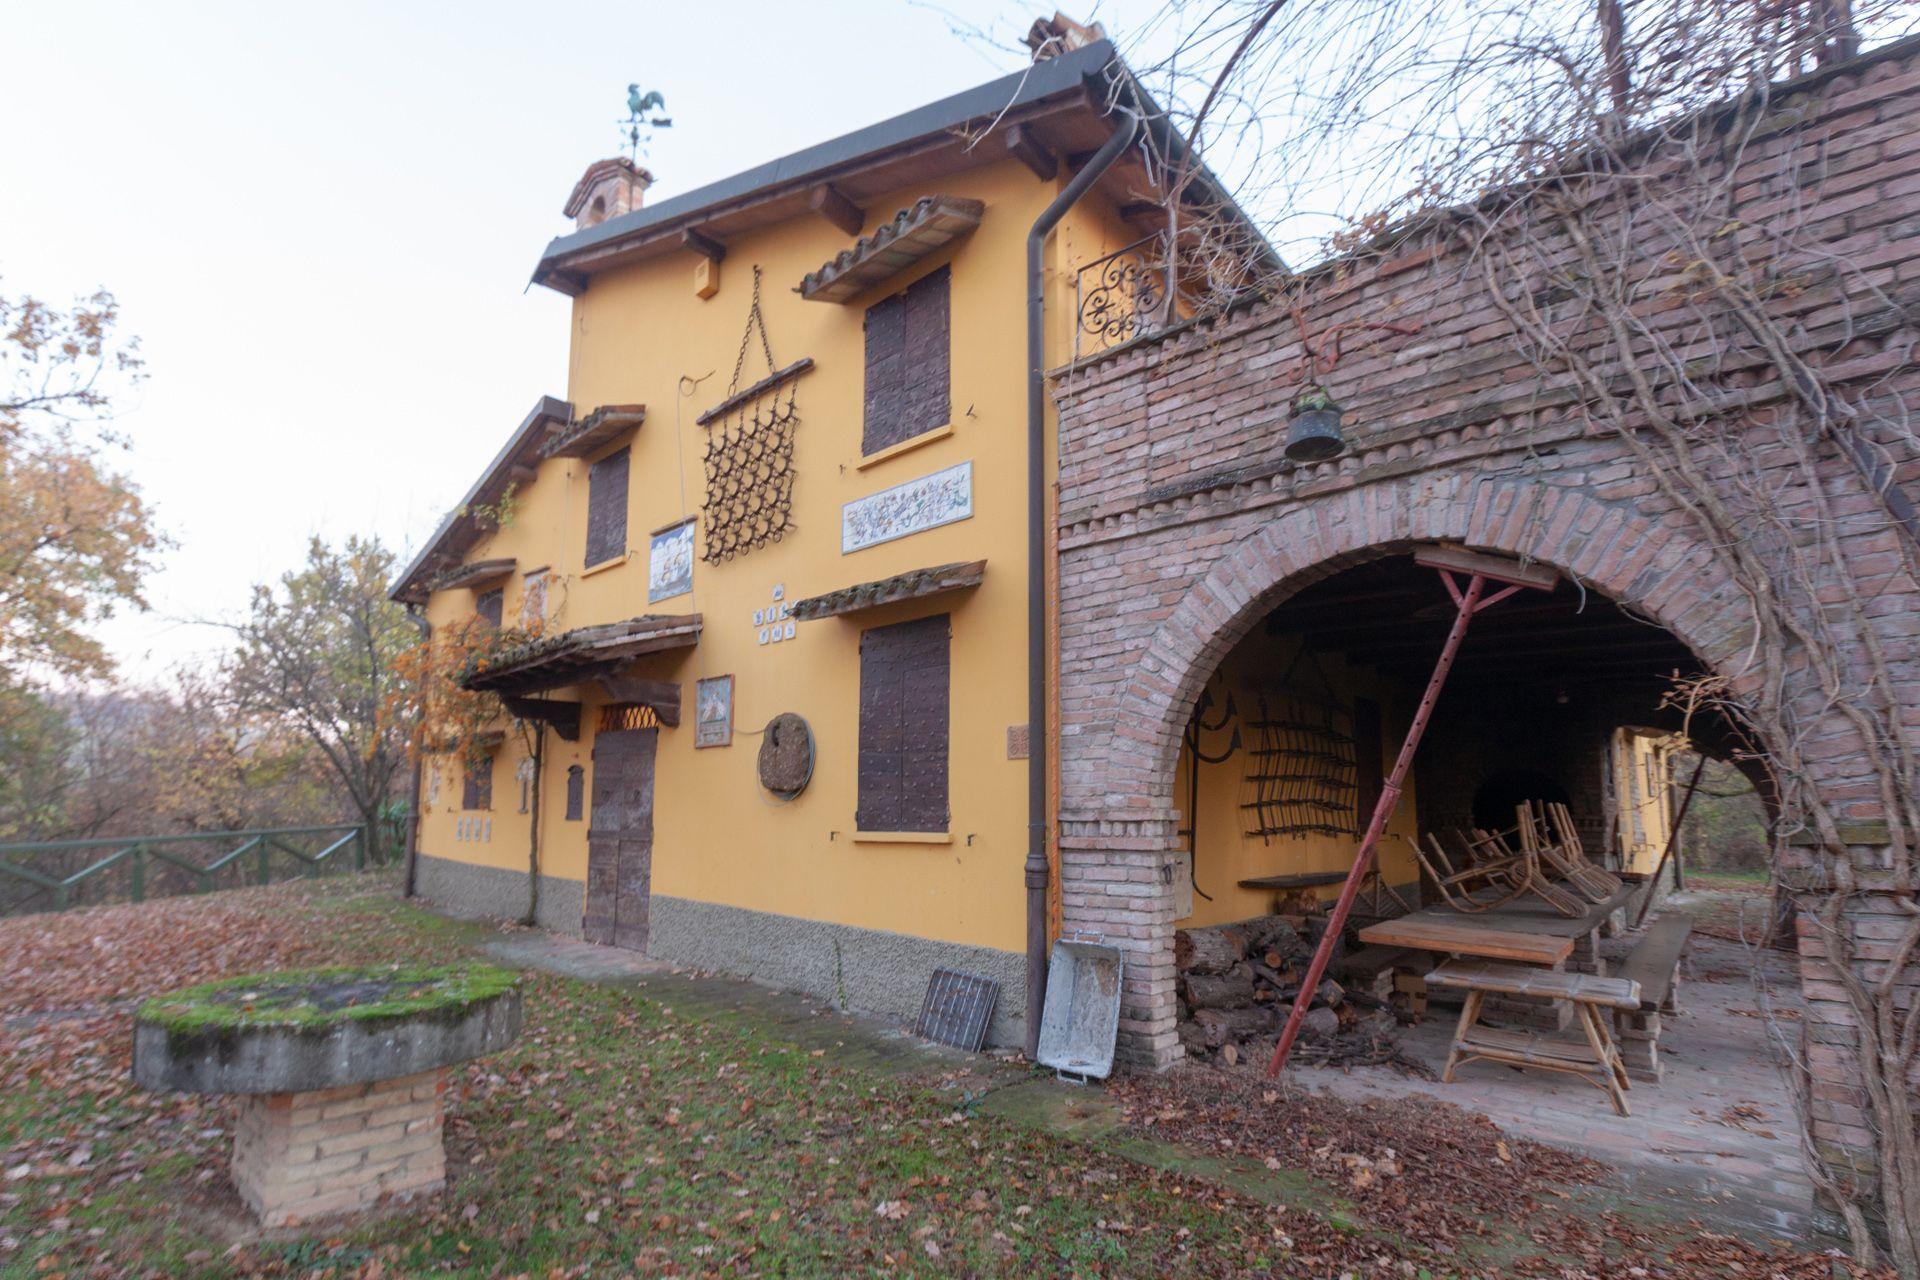 Casa de campo en Maranello, Collinare Modenese, venta